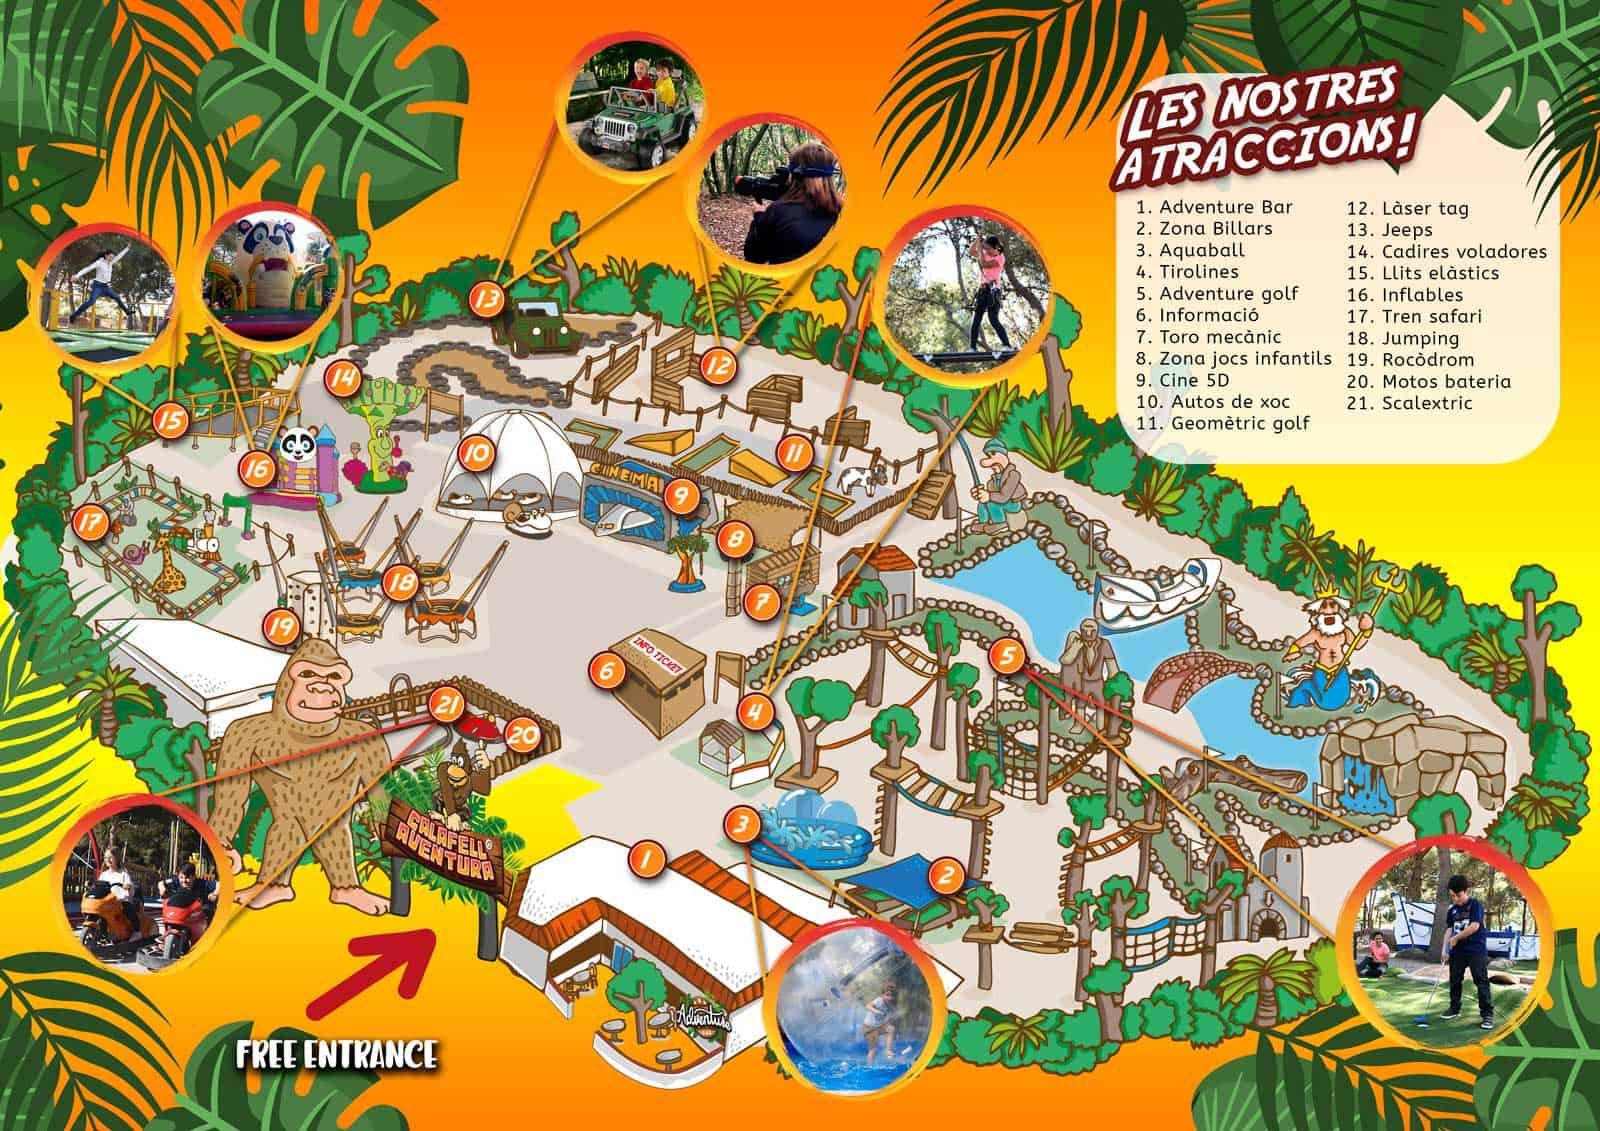 mapa del parque Calafell aventura